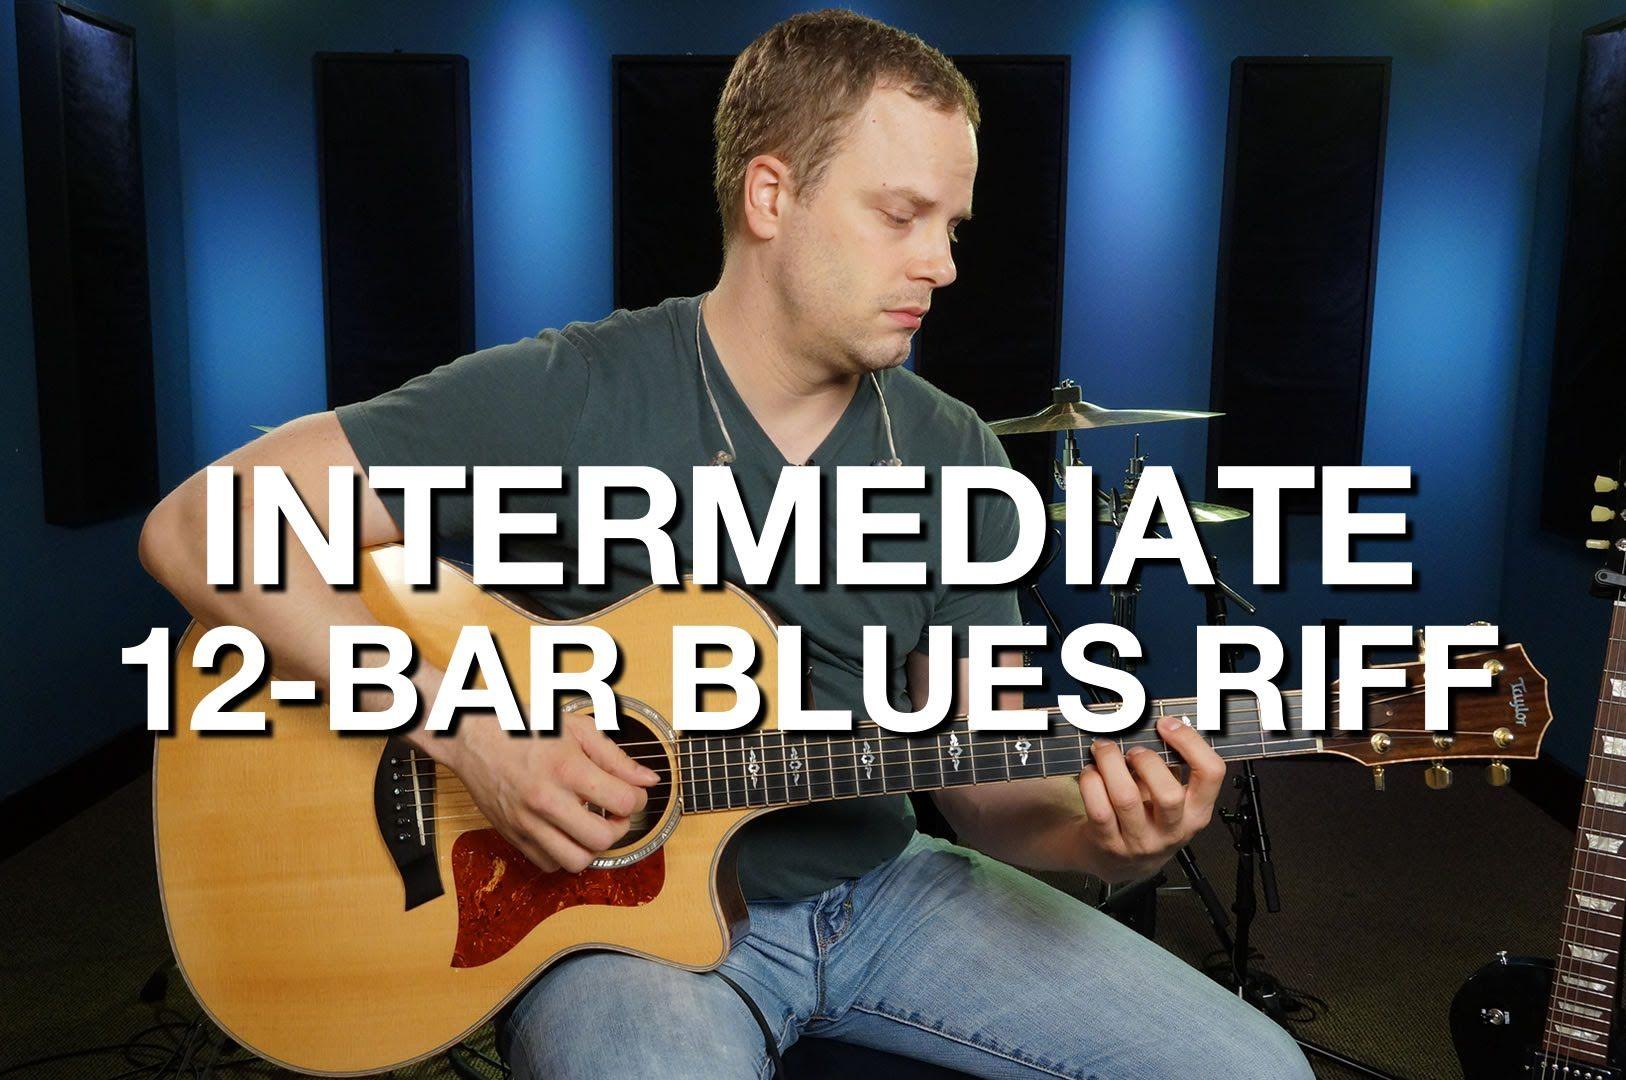 Intermediate 12 Bar Blues Riff Blues Guitar Lesson 5 Blues Guitar Lessons Blues Guitar Guitar Lessons